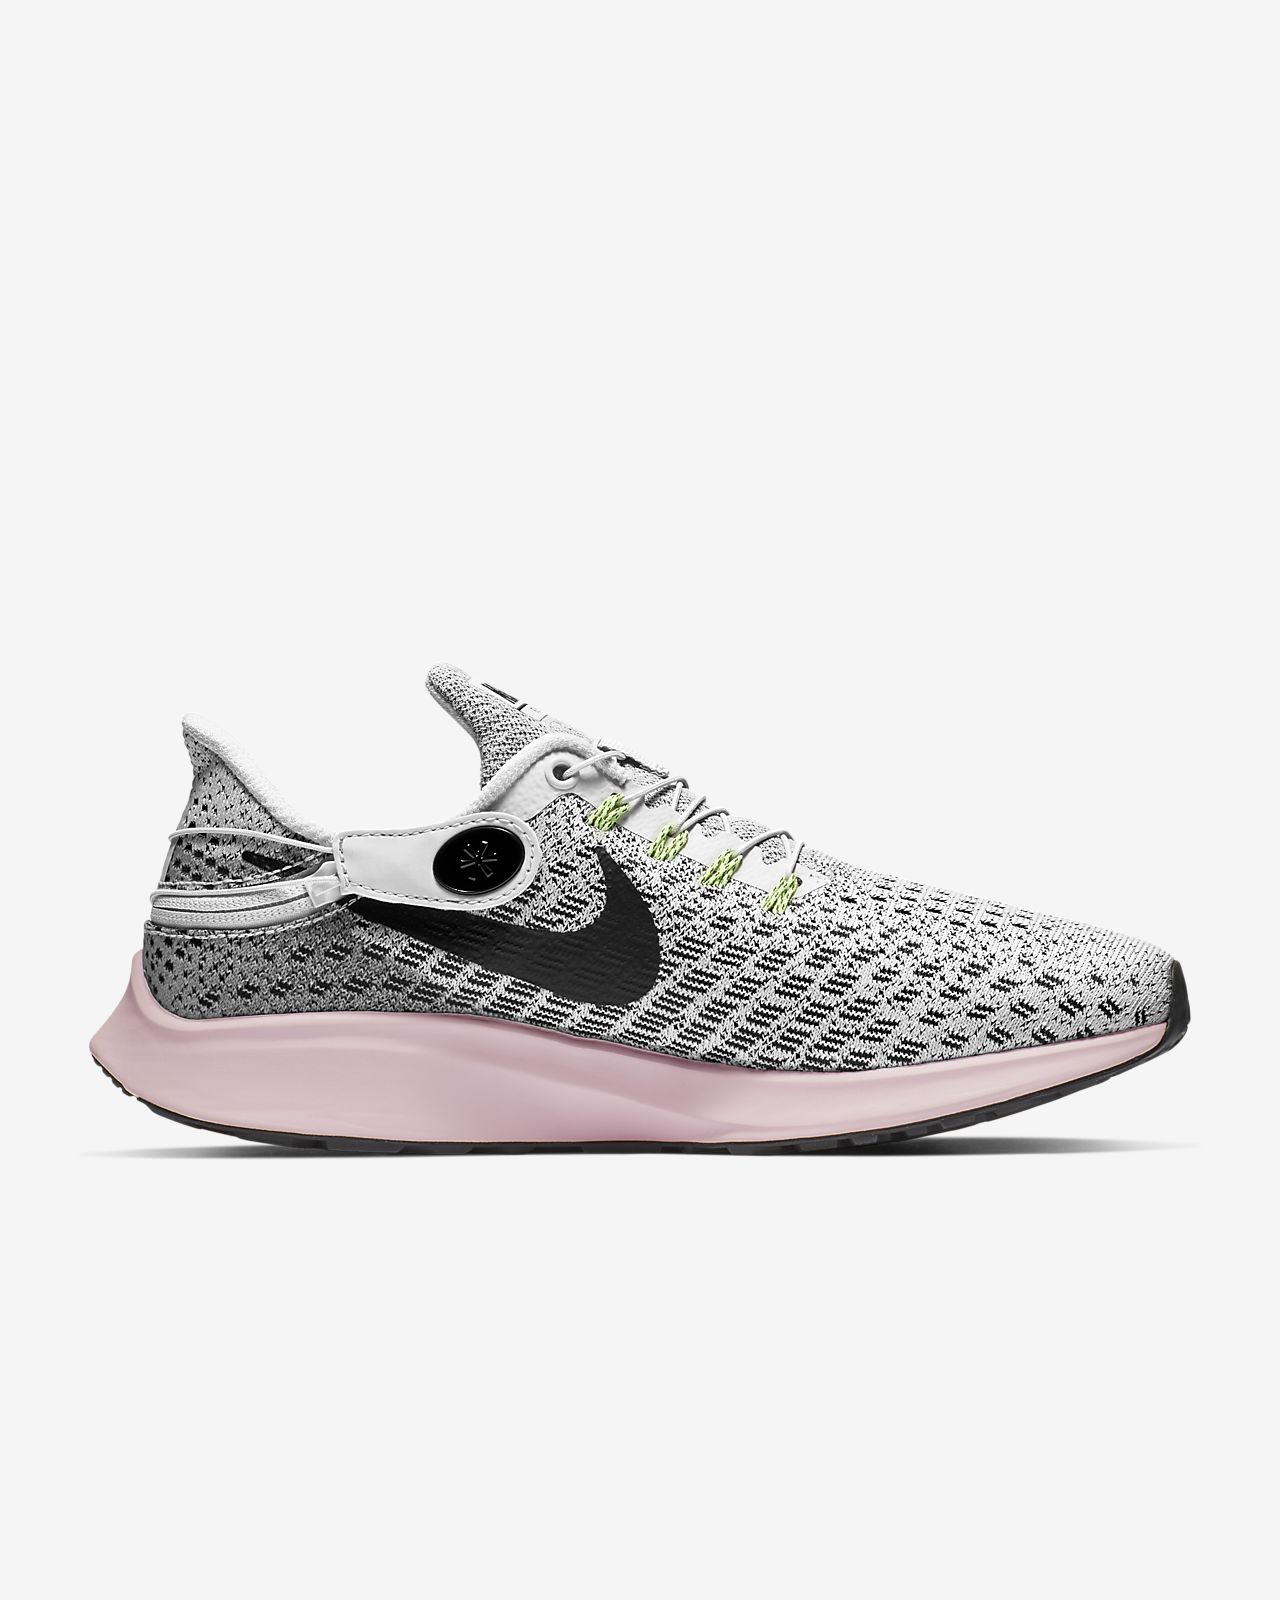 600a5bf94f927 Nike Air Zoom Pegasus 35 FlyEase Women s Running Shoe. Nike.com DK